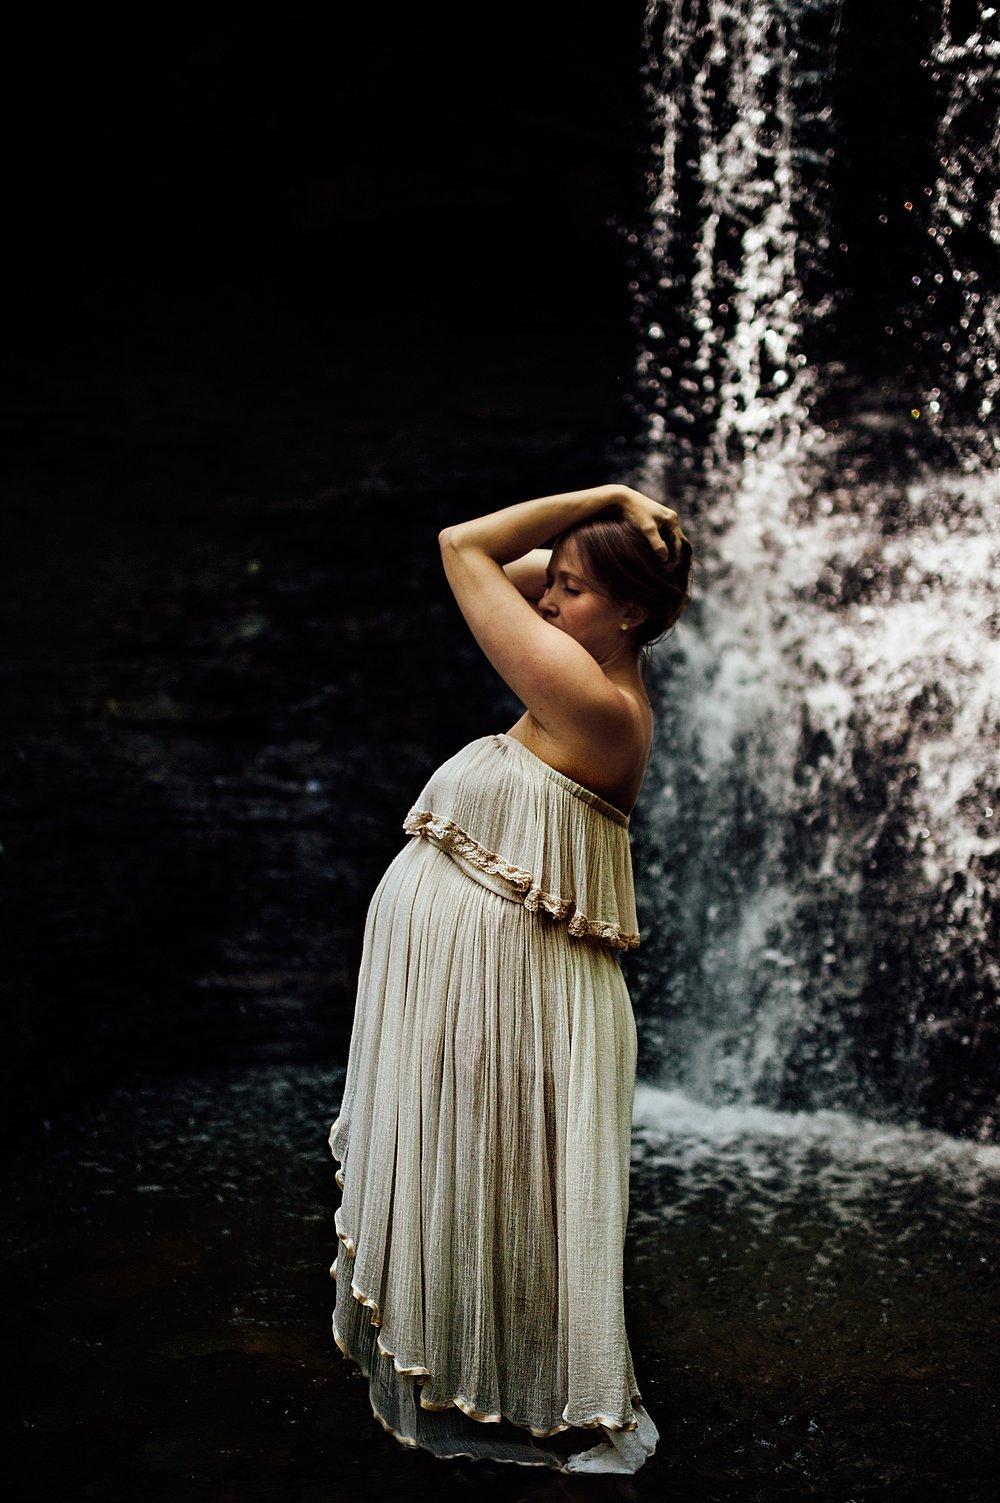 lauren-grayson-photography-akron-ohio-maternity-photographer-waterfall-sarah-f_0013.jpg